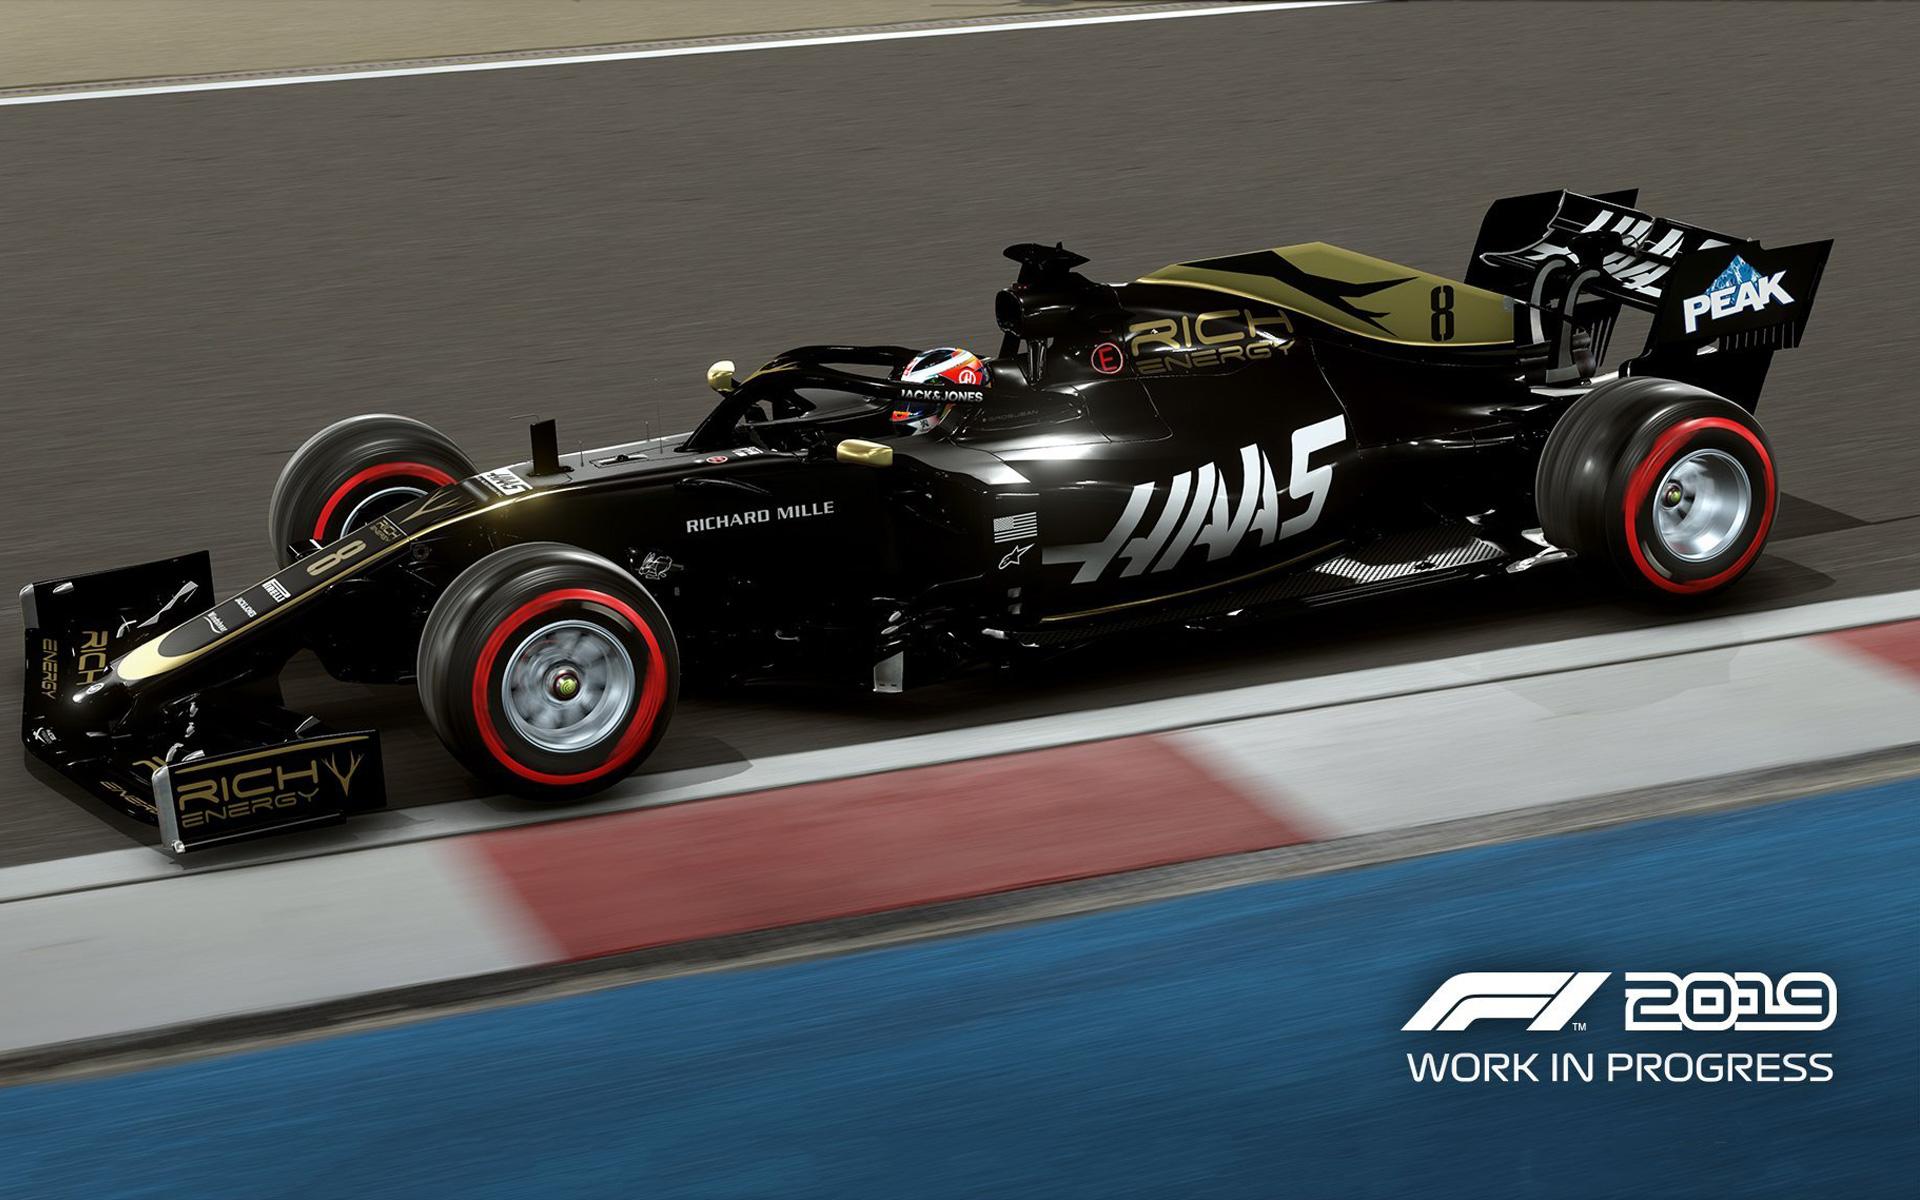 F1 2019 Wallpaper in 1920x1200